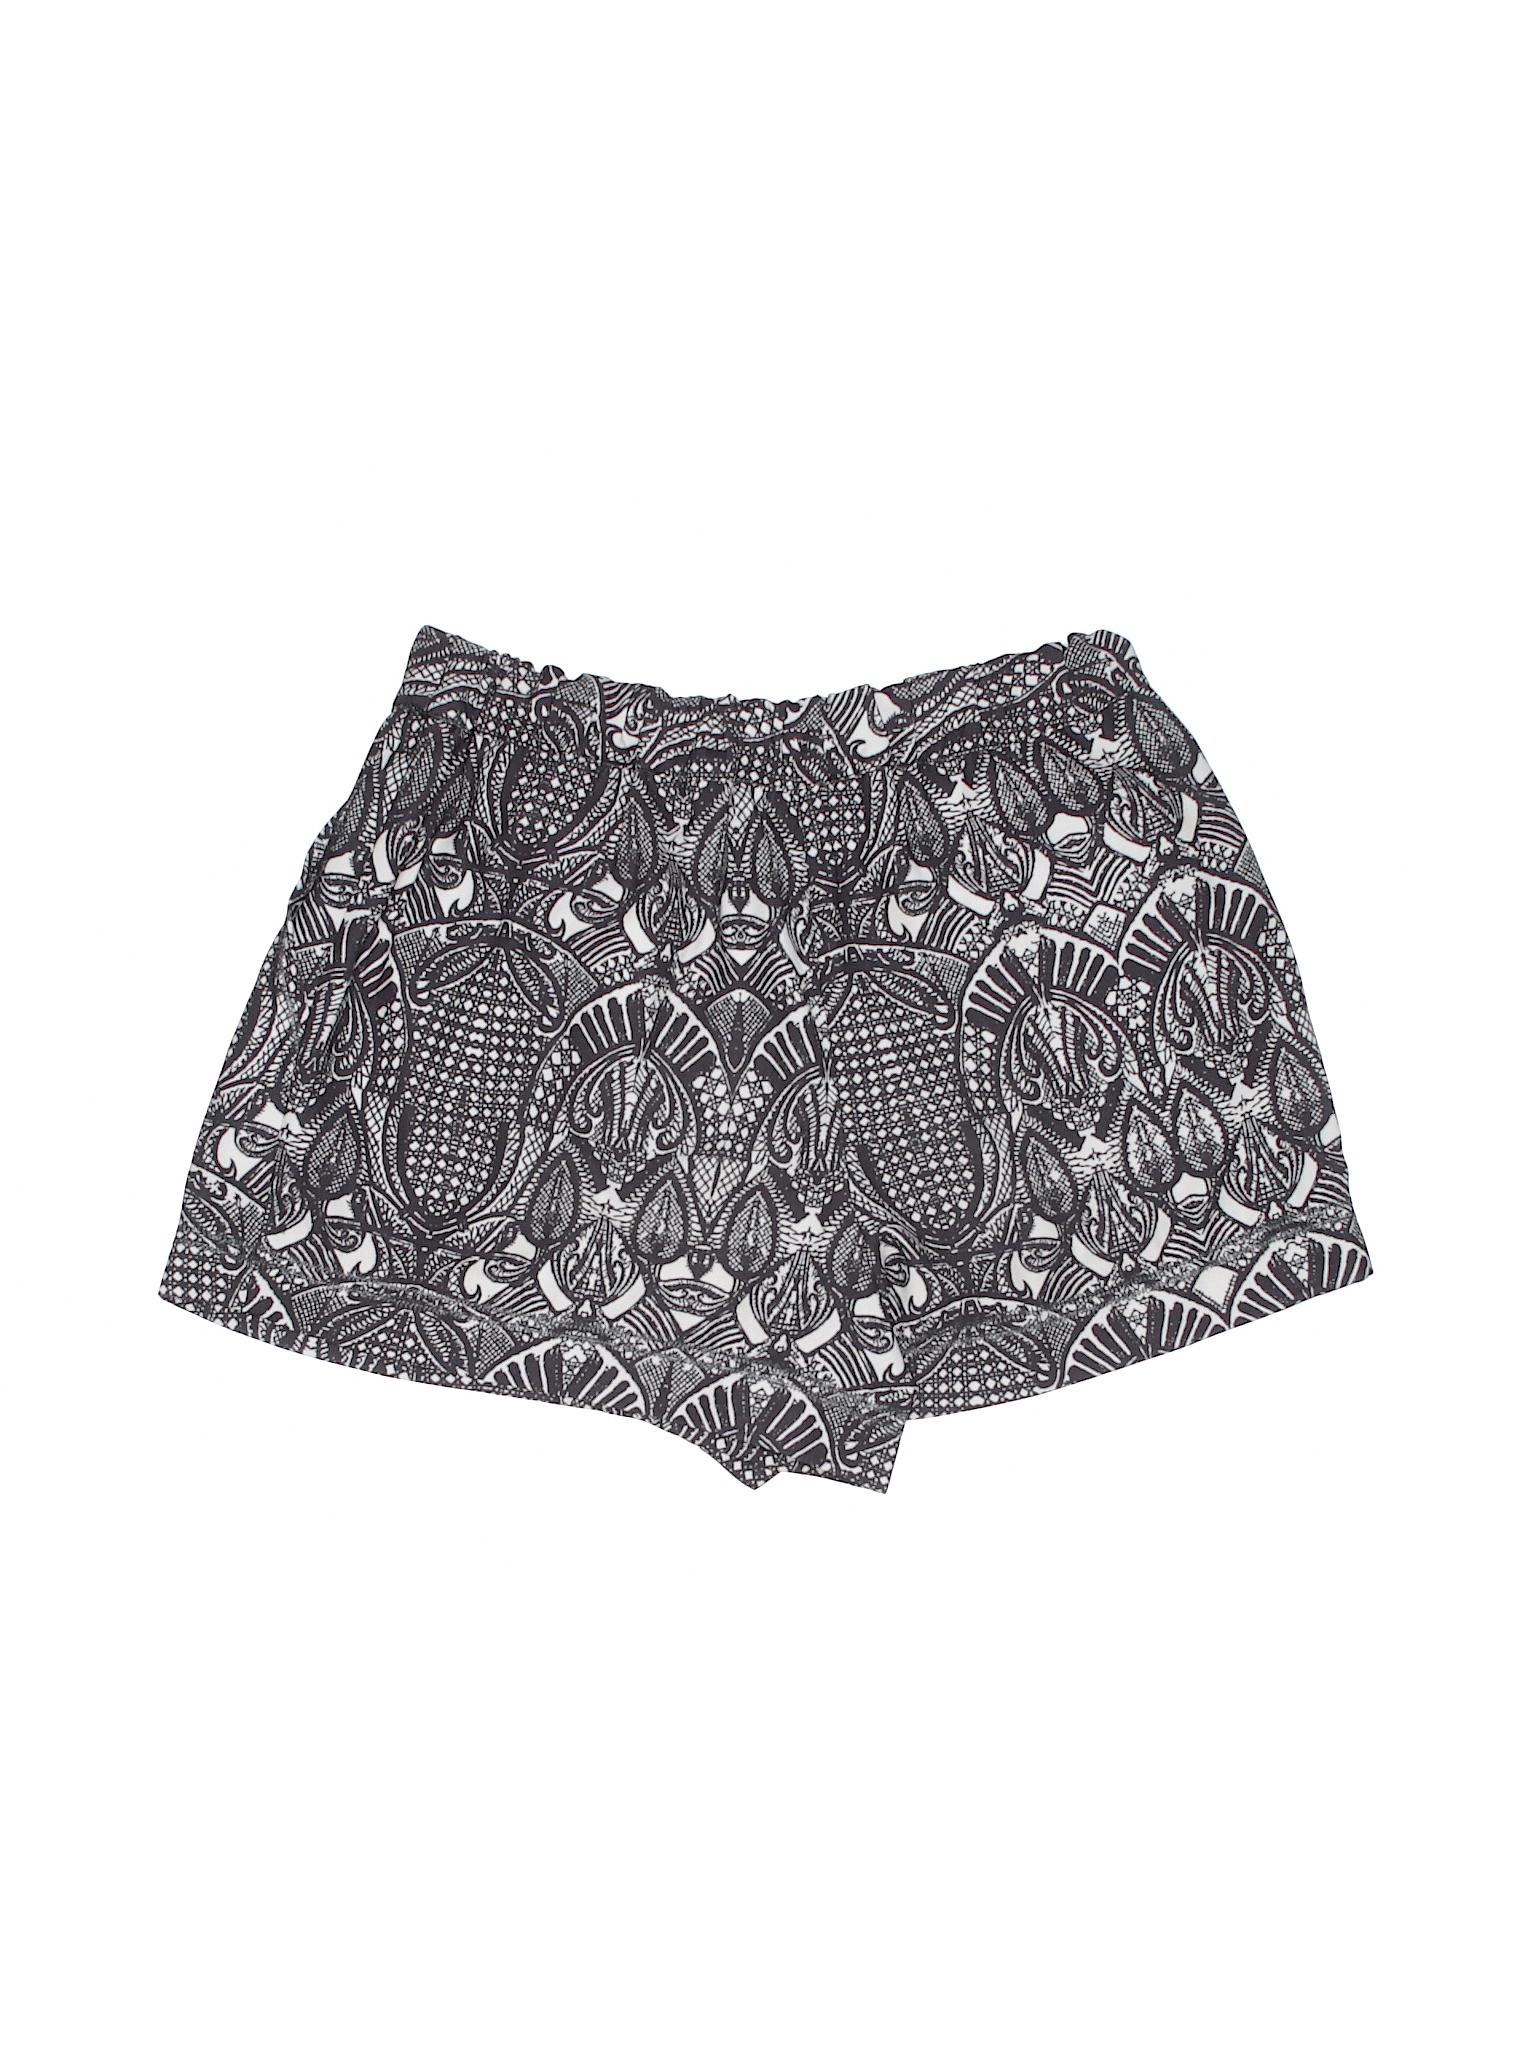 Shorts Dressy Gentle Fawn Shorts Fawn Boutique Gentle Boutique Dressy qO1UTwEn